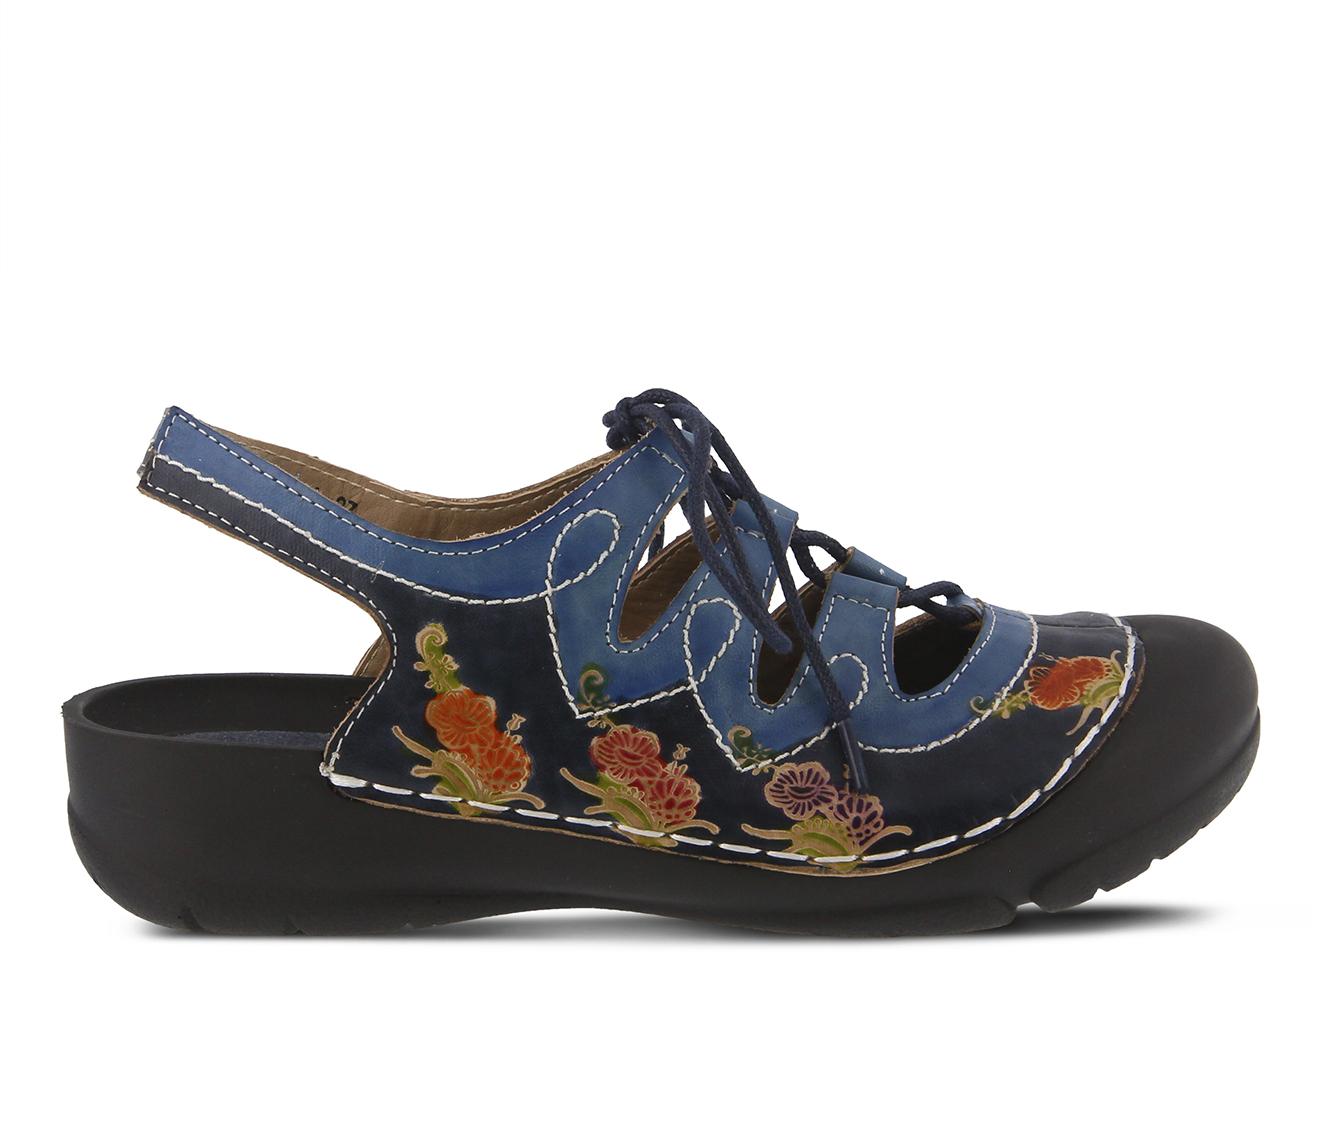 L'Artiste Vesta Women's Shoe (Blue Leather)